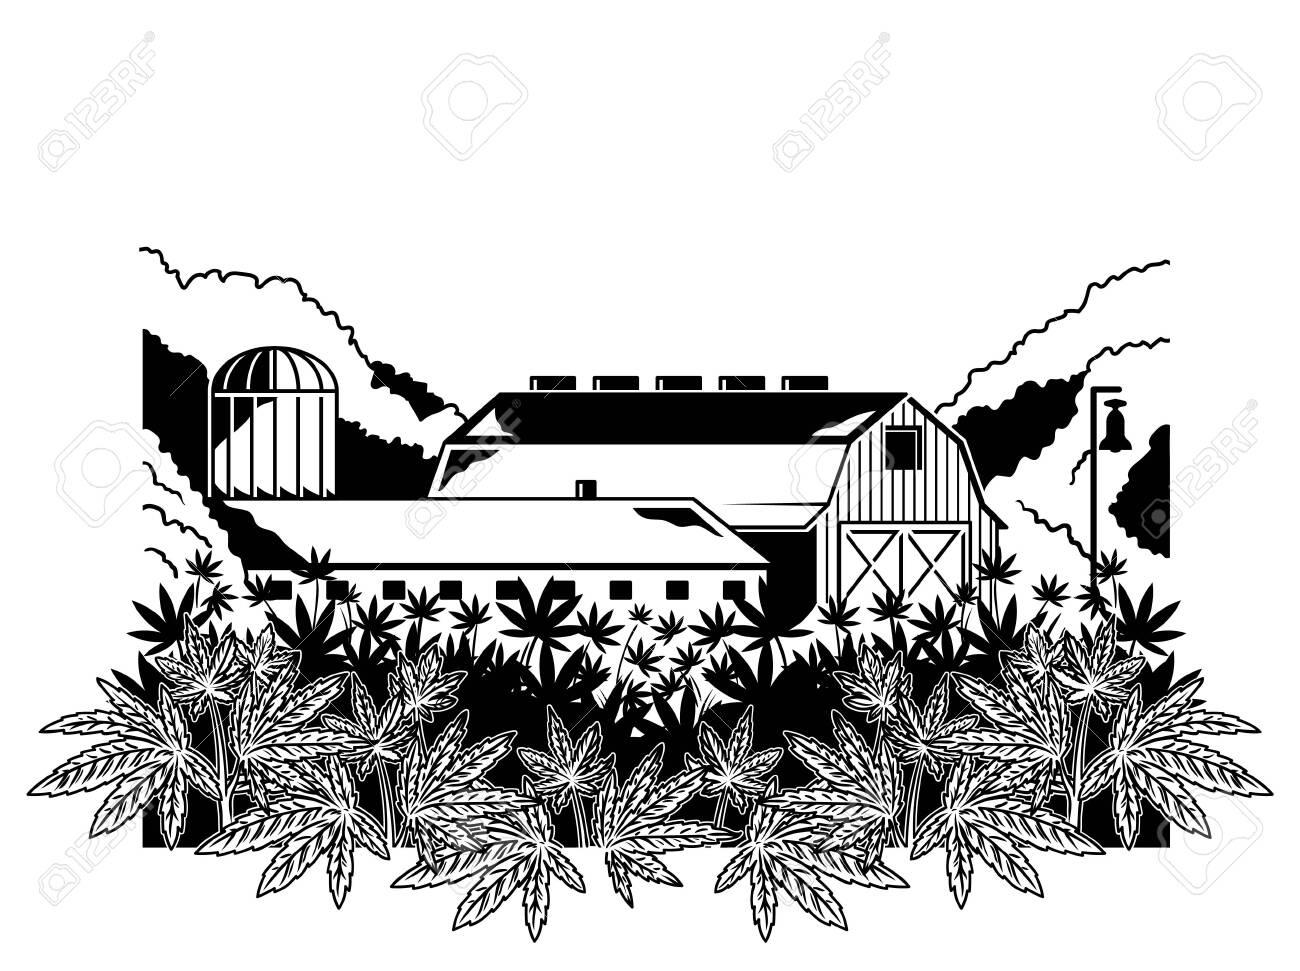 Big Cannabis Farm Plantation Of Marijuana Natural Product From Royalty Free Cliparts Vectors And Stock Illustration Image 127836544